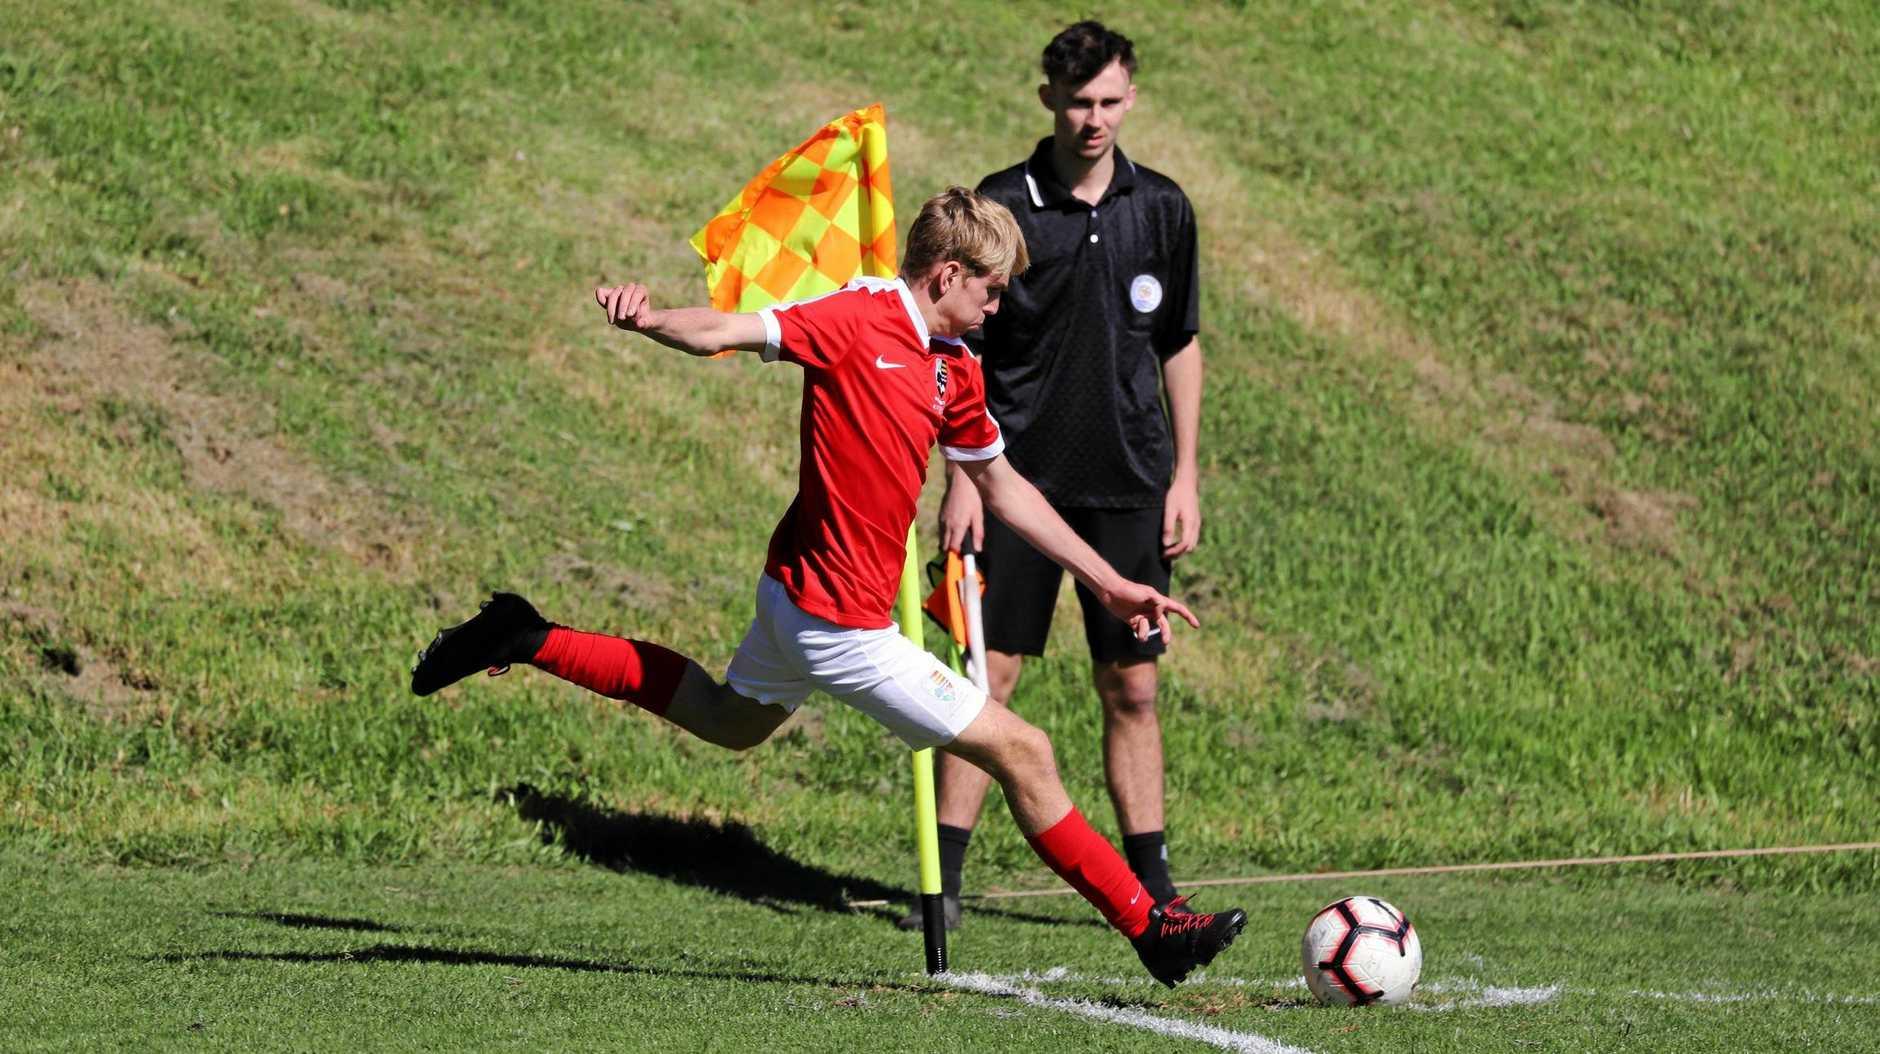 Ipswich Grammar School footballer Elijah Vincent-Tooth prepares to take a corner in his latest GPS match in Toowoomba.